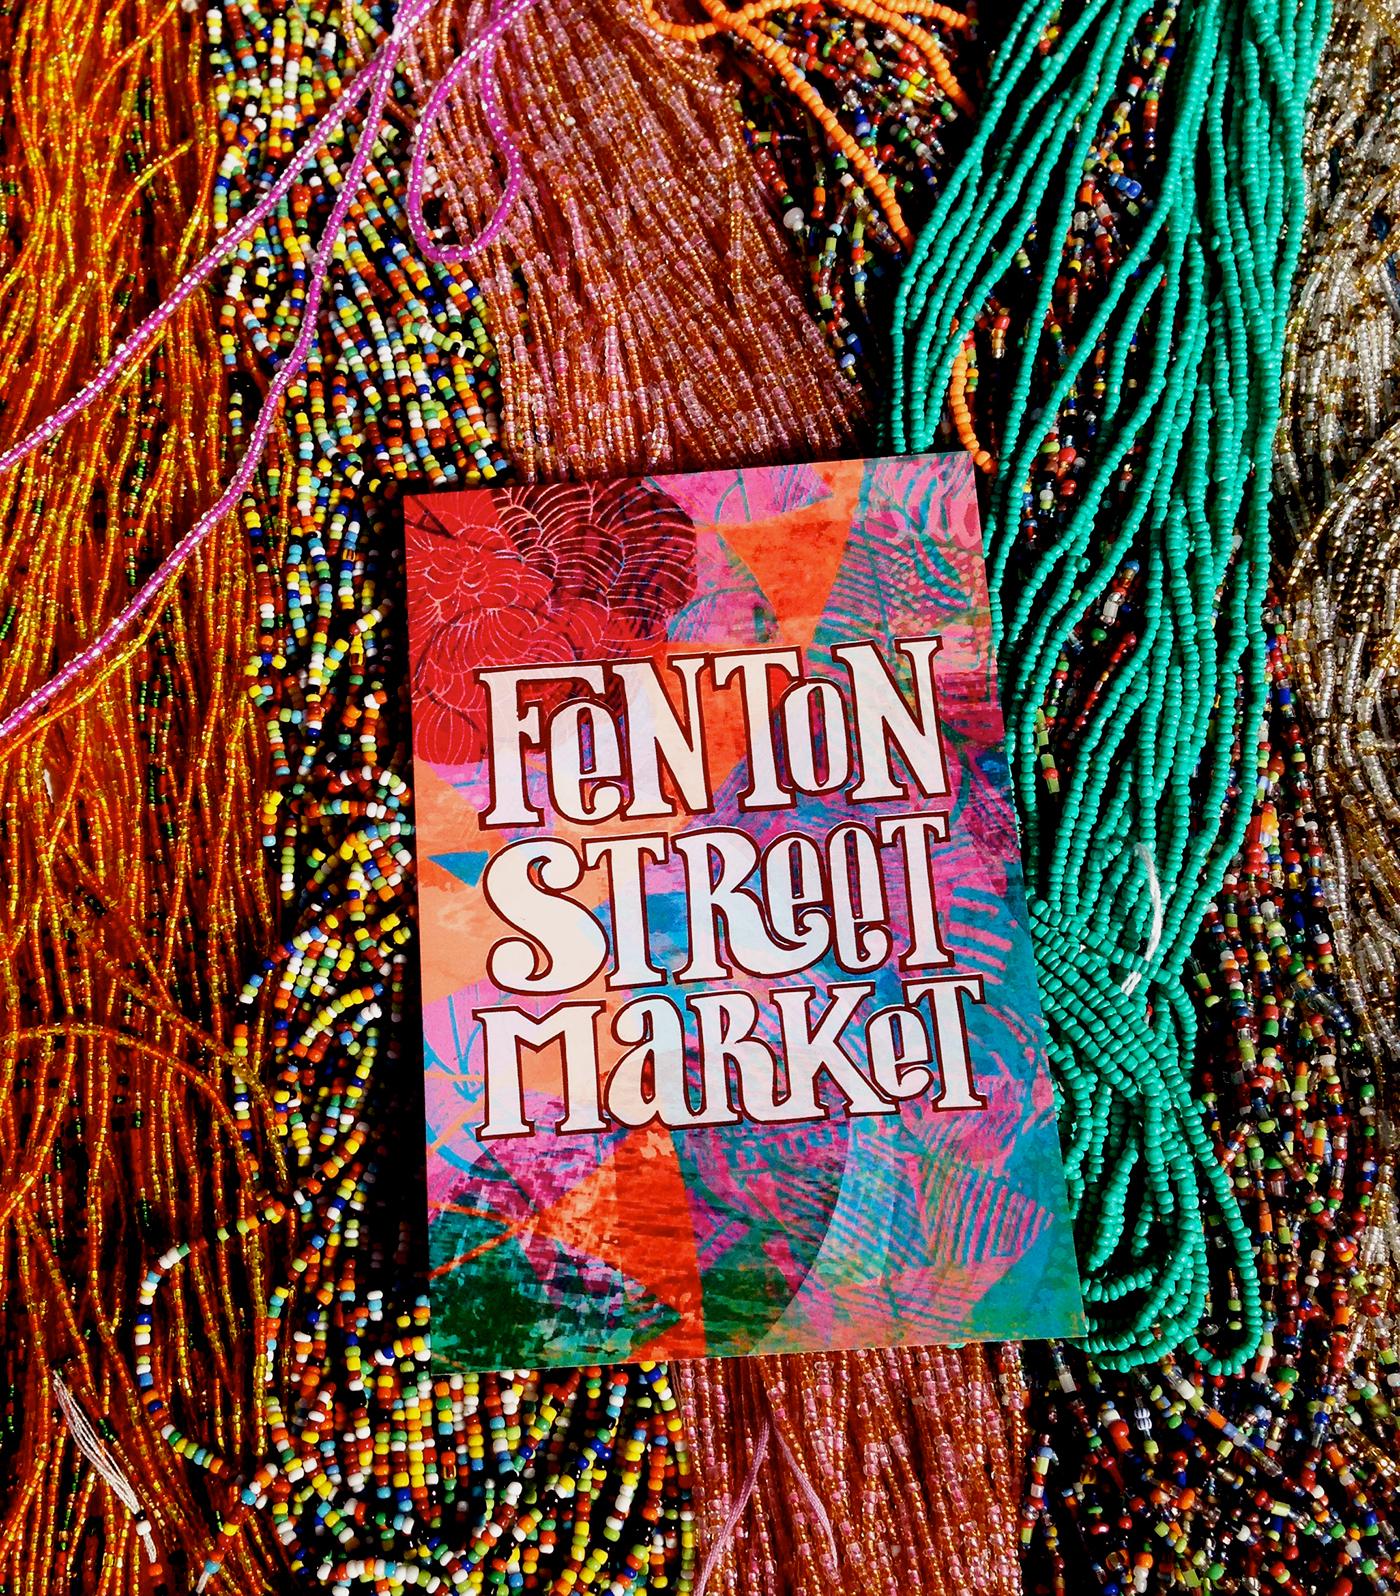 aliana grace bailey art design fenton street market abstract color.jpg